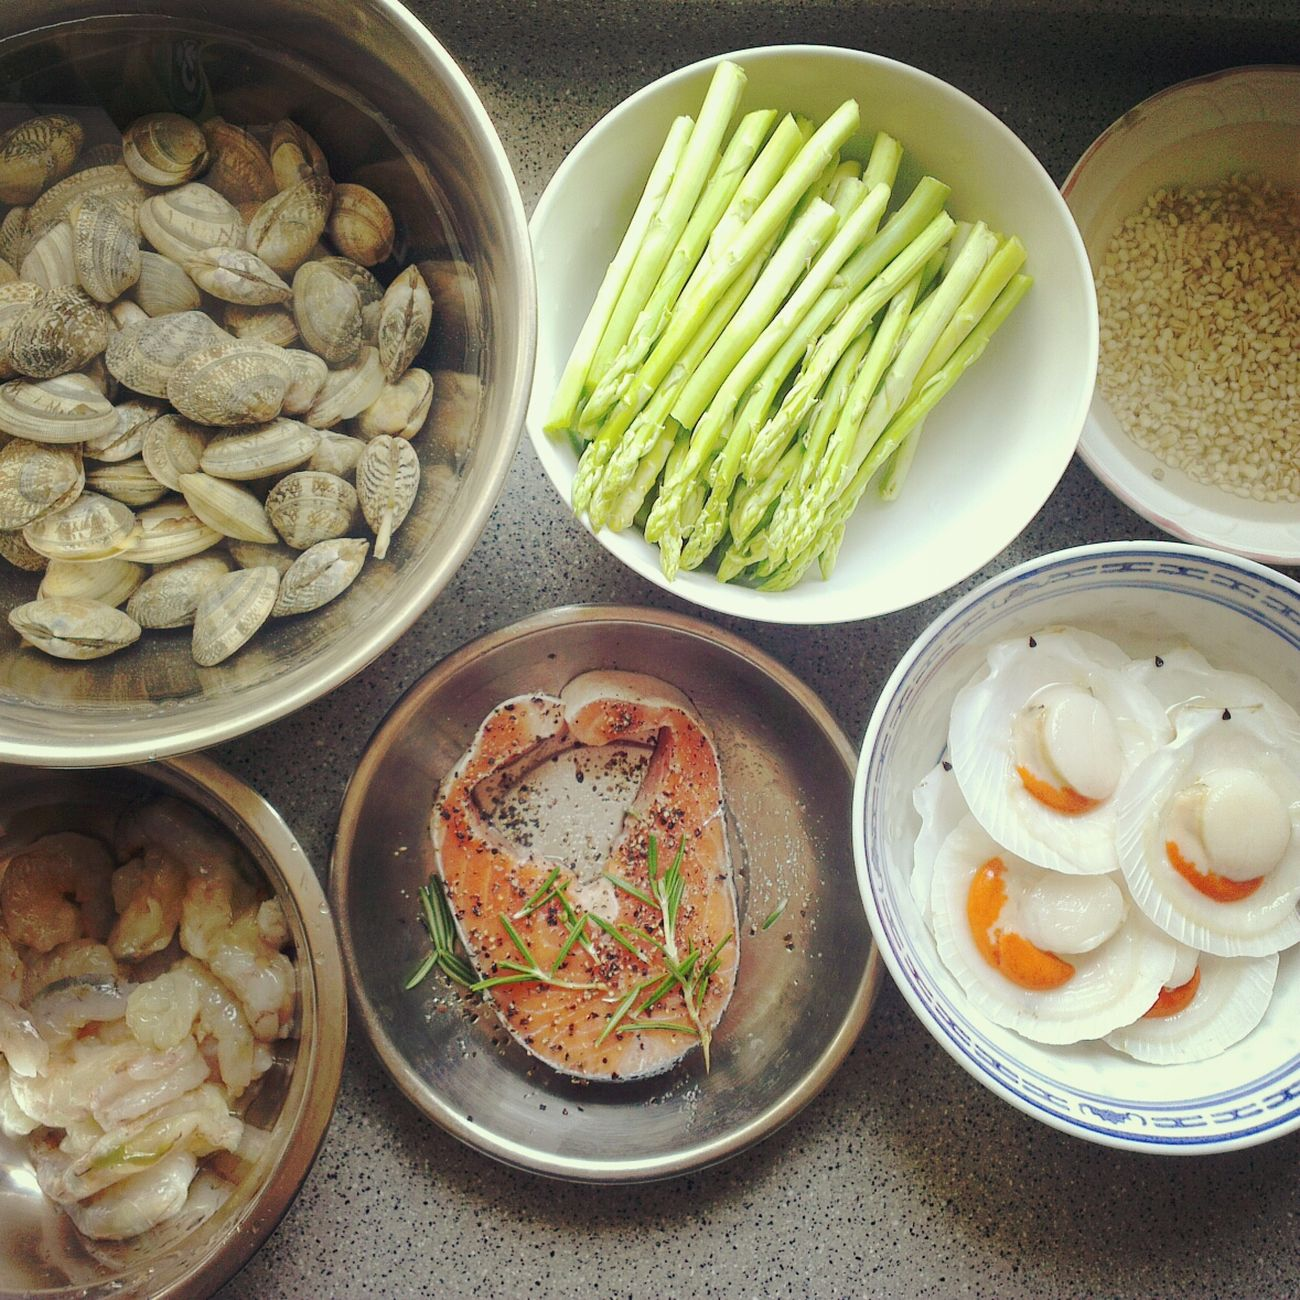 想念為你準備晚餐的那份幸福 Seafood Cooking At Home Dinner Date